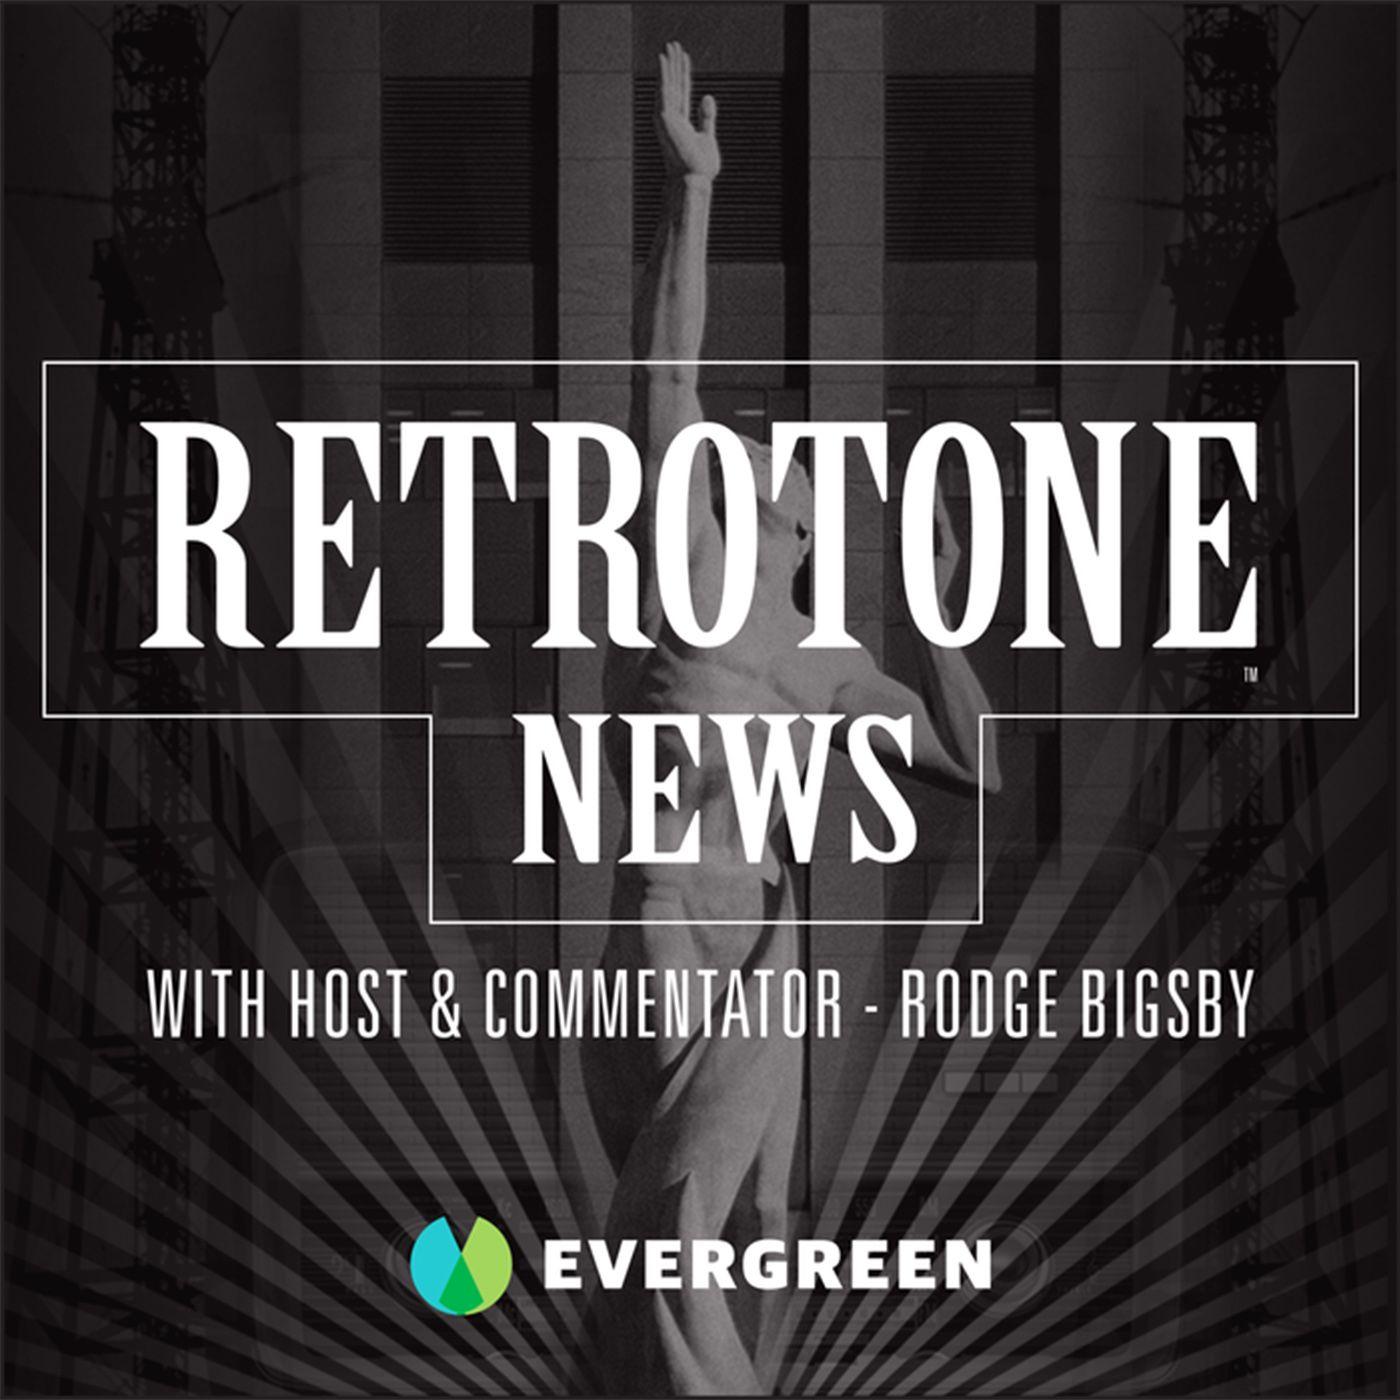 This Week in News: 7/11/19